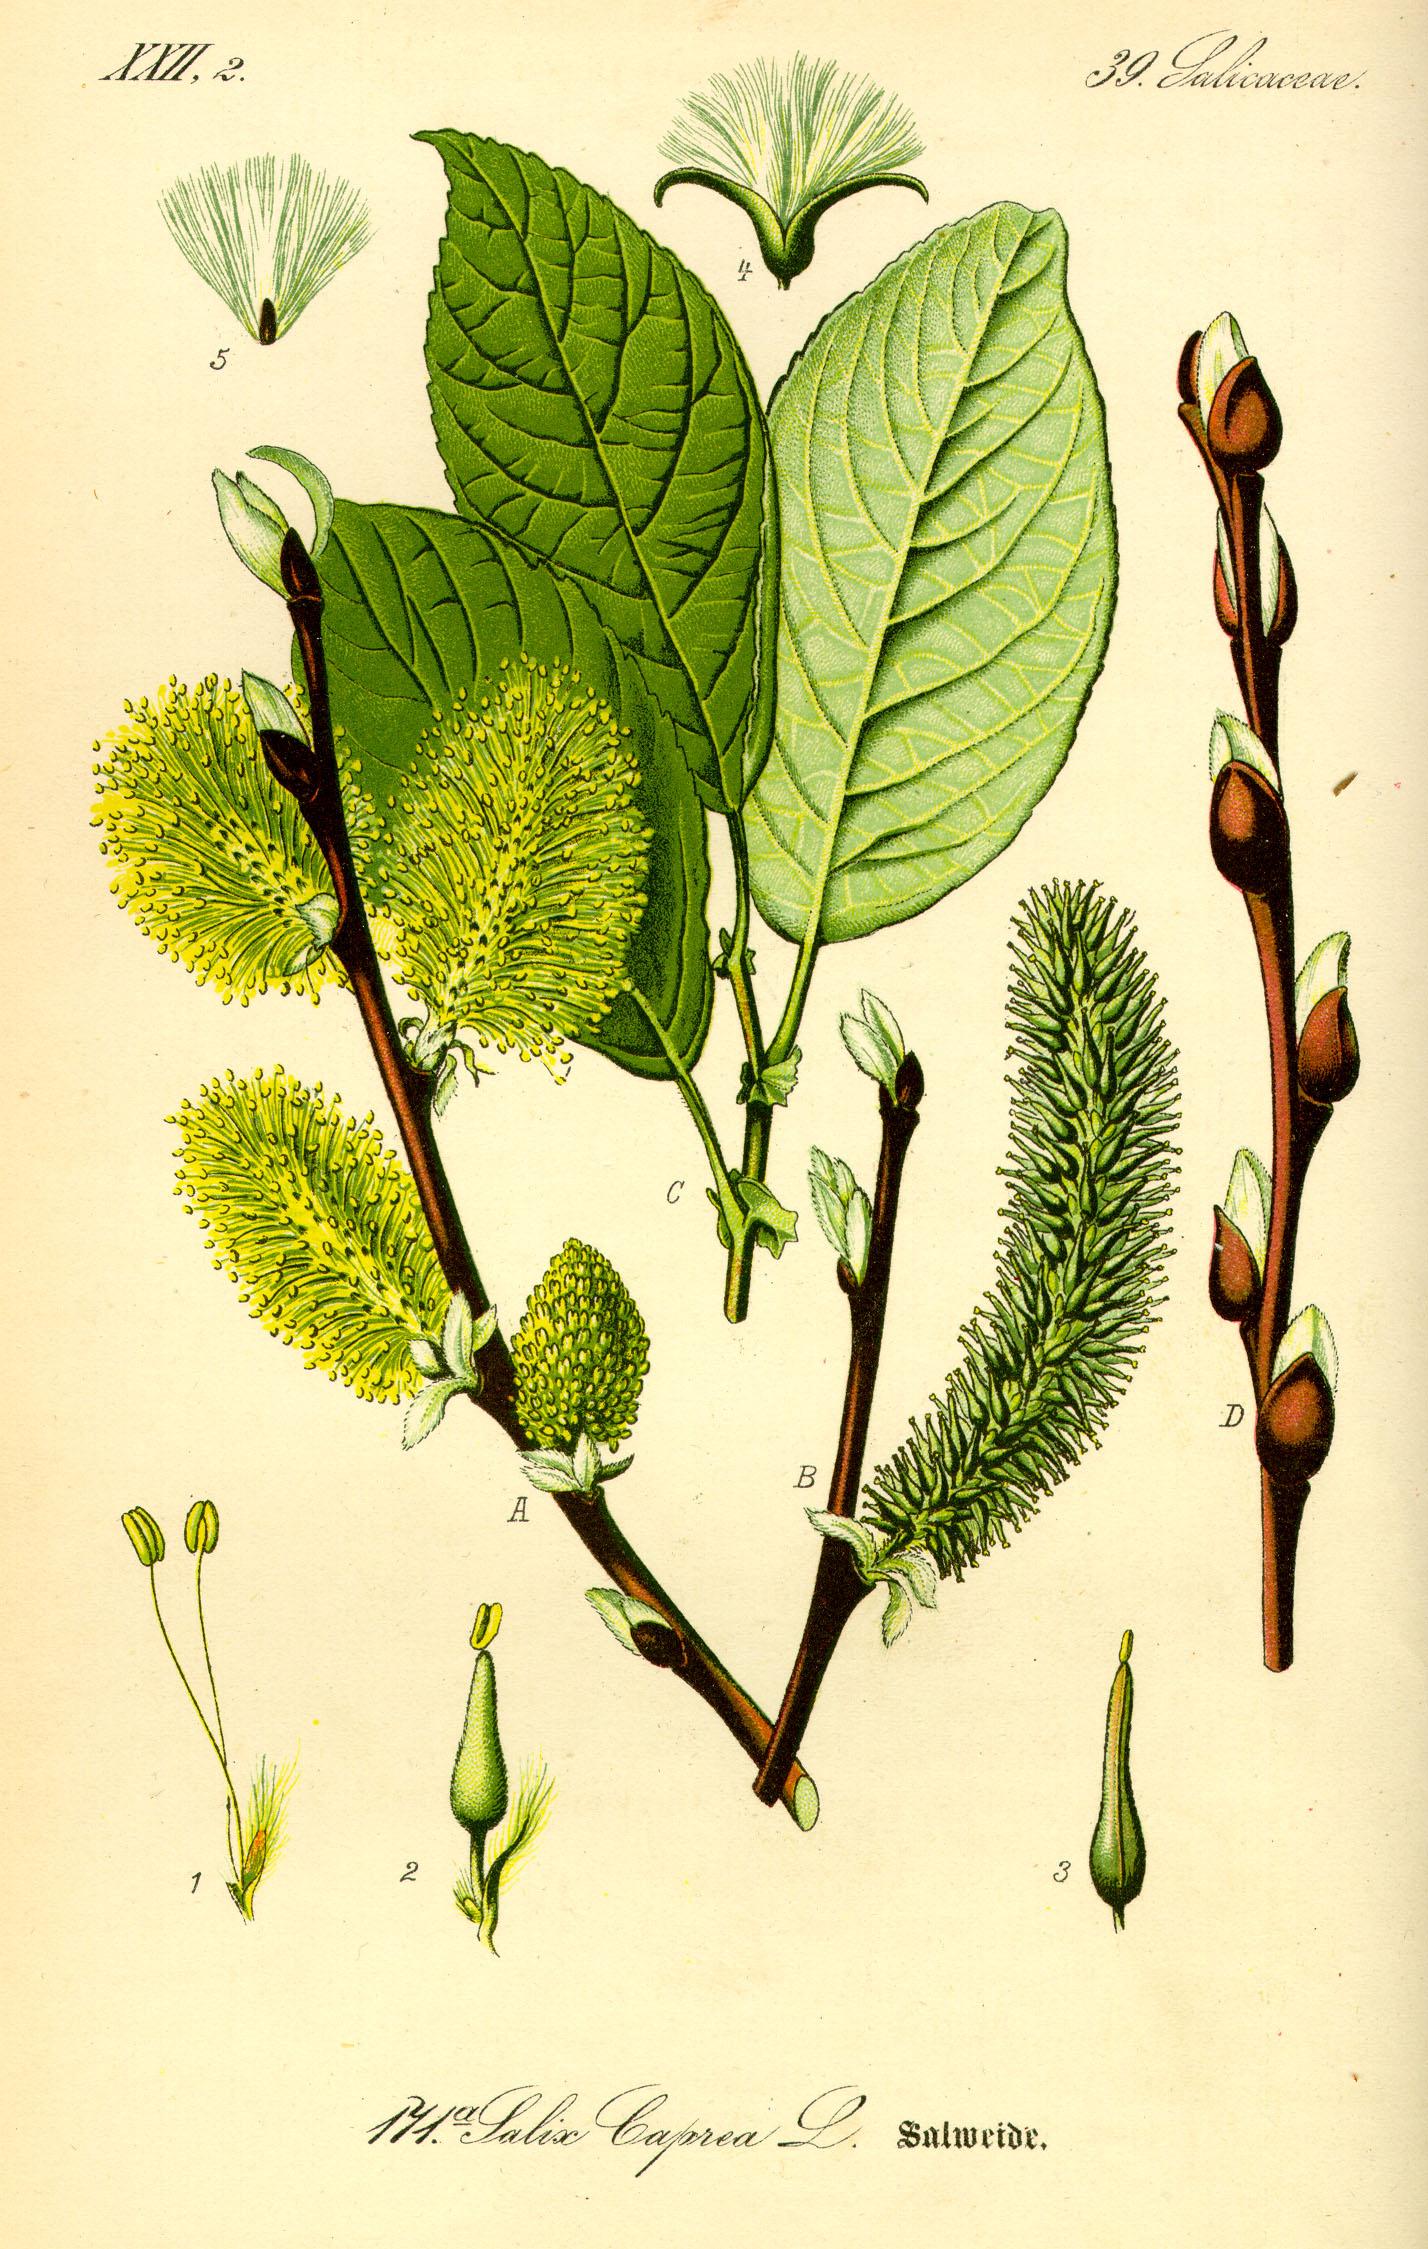 Salix_caprea_ fonte wikimedia commons 2